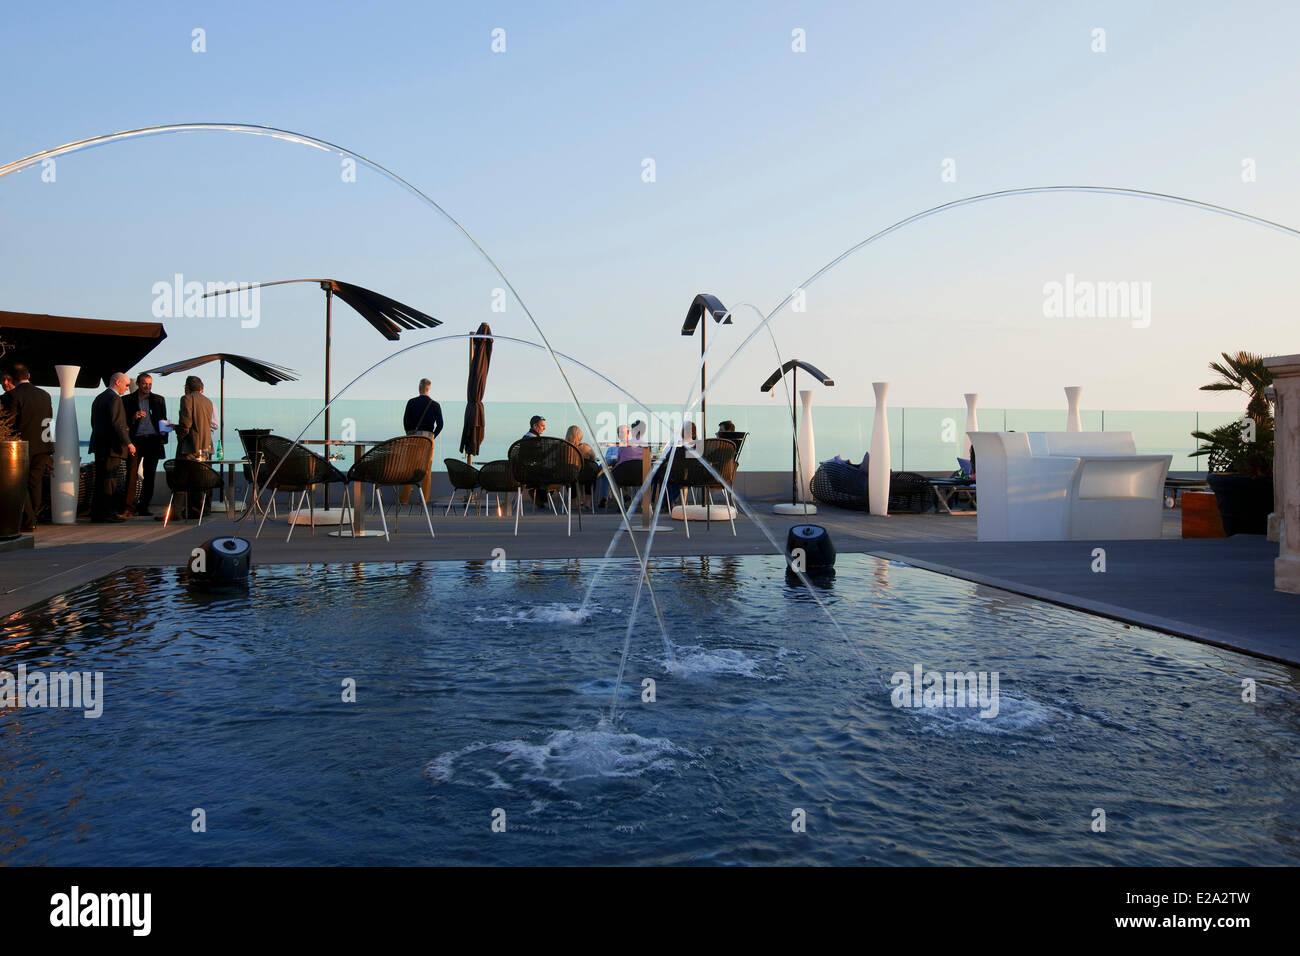 France, Alpes Maritimes, Cannes, Hotel Radisson Blu, rooftop terrace - Stock Image